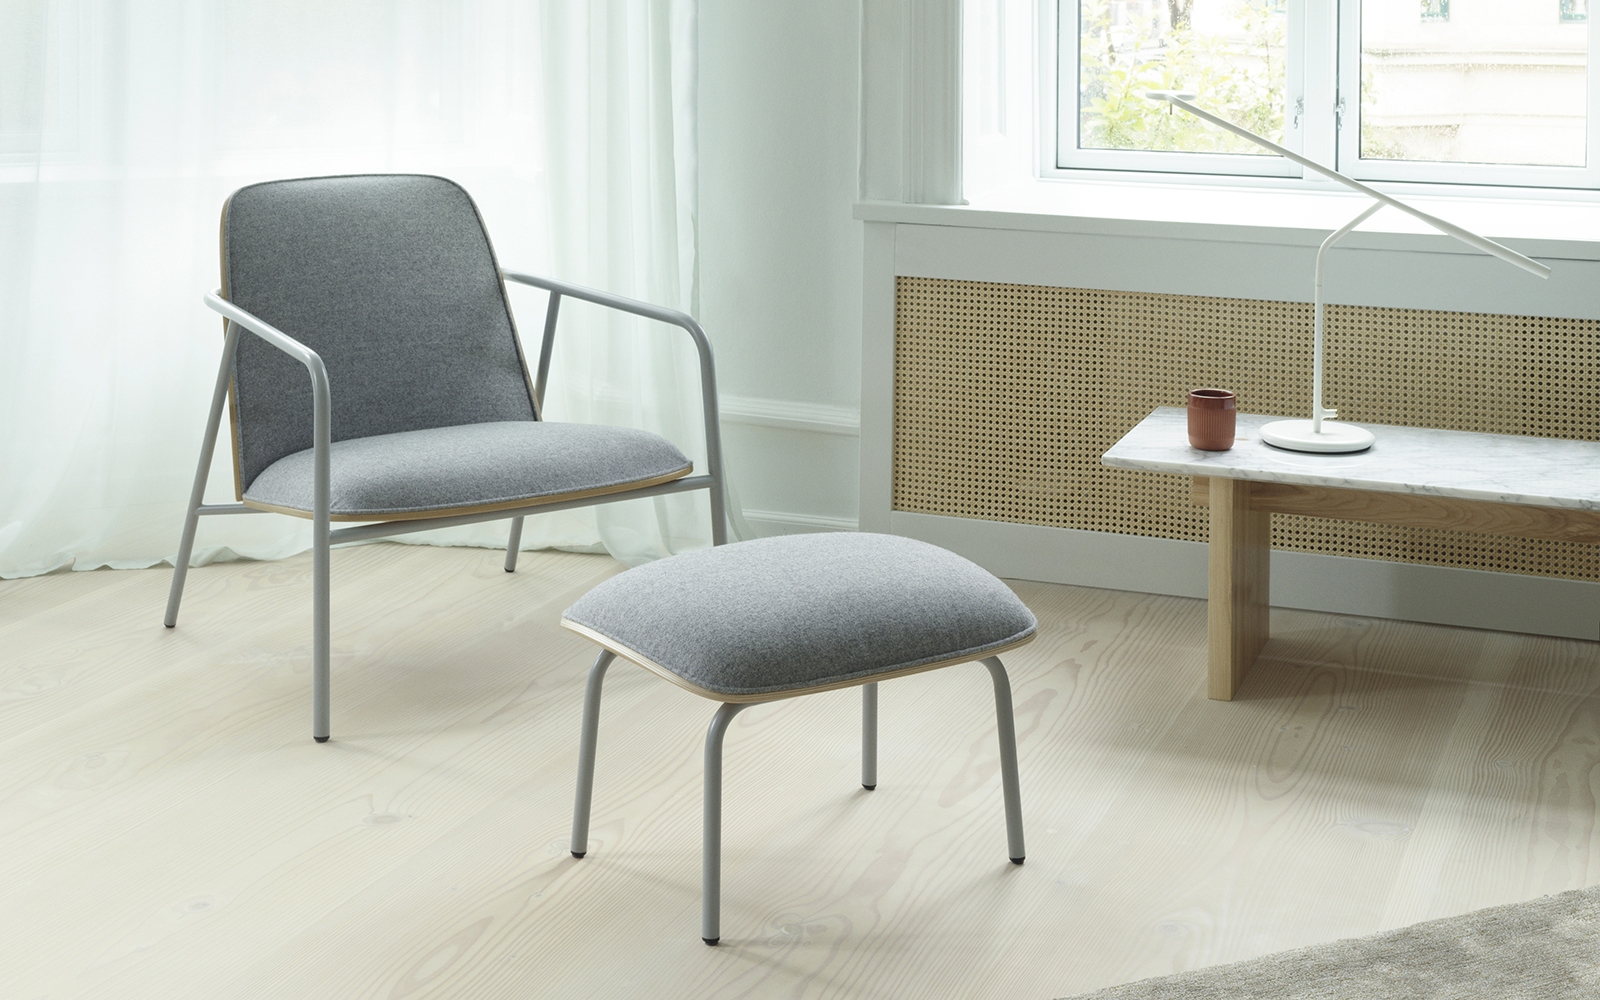 Pad Lounge Chair High Grey Steel Black Synergy